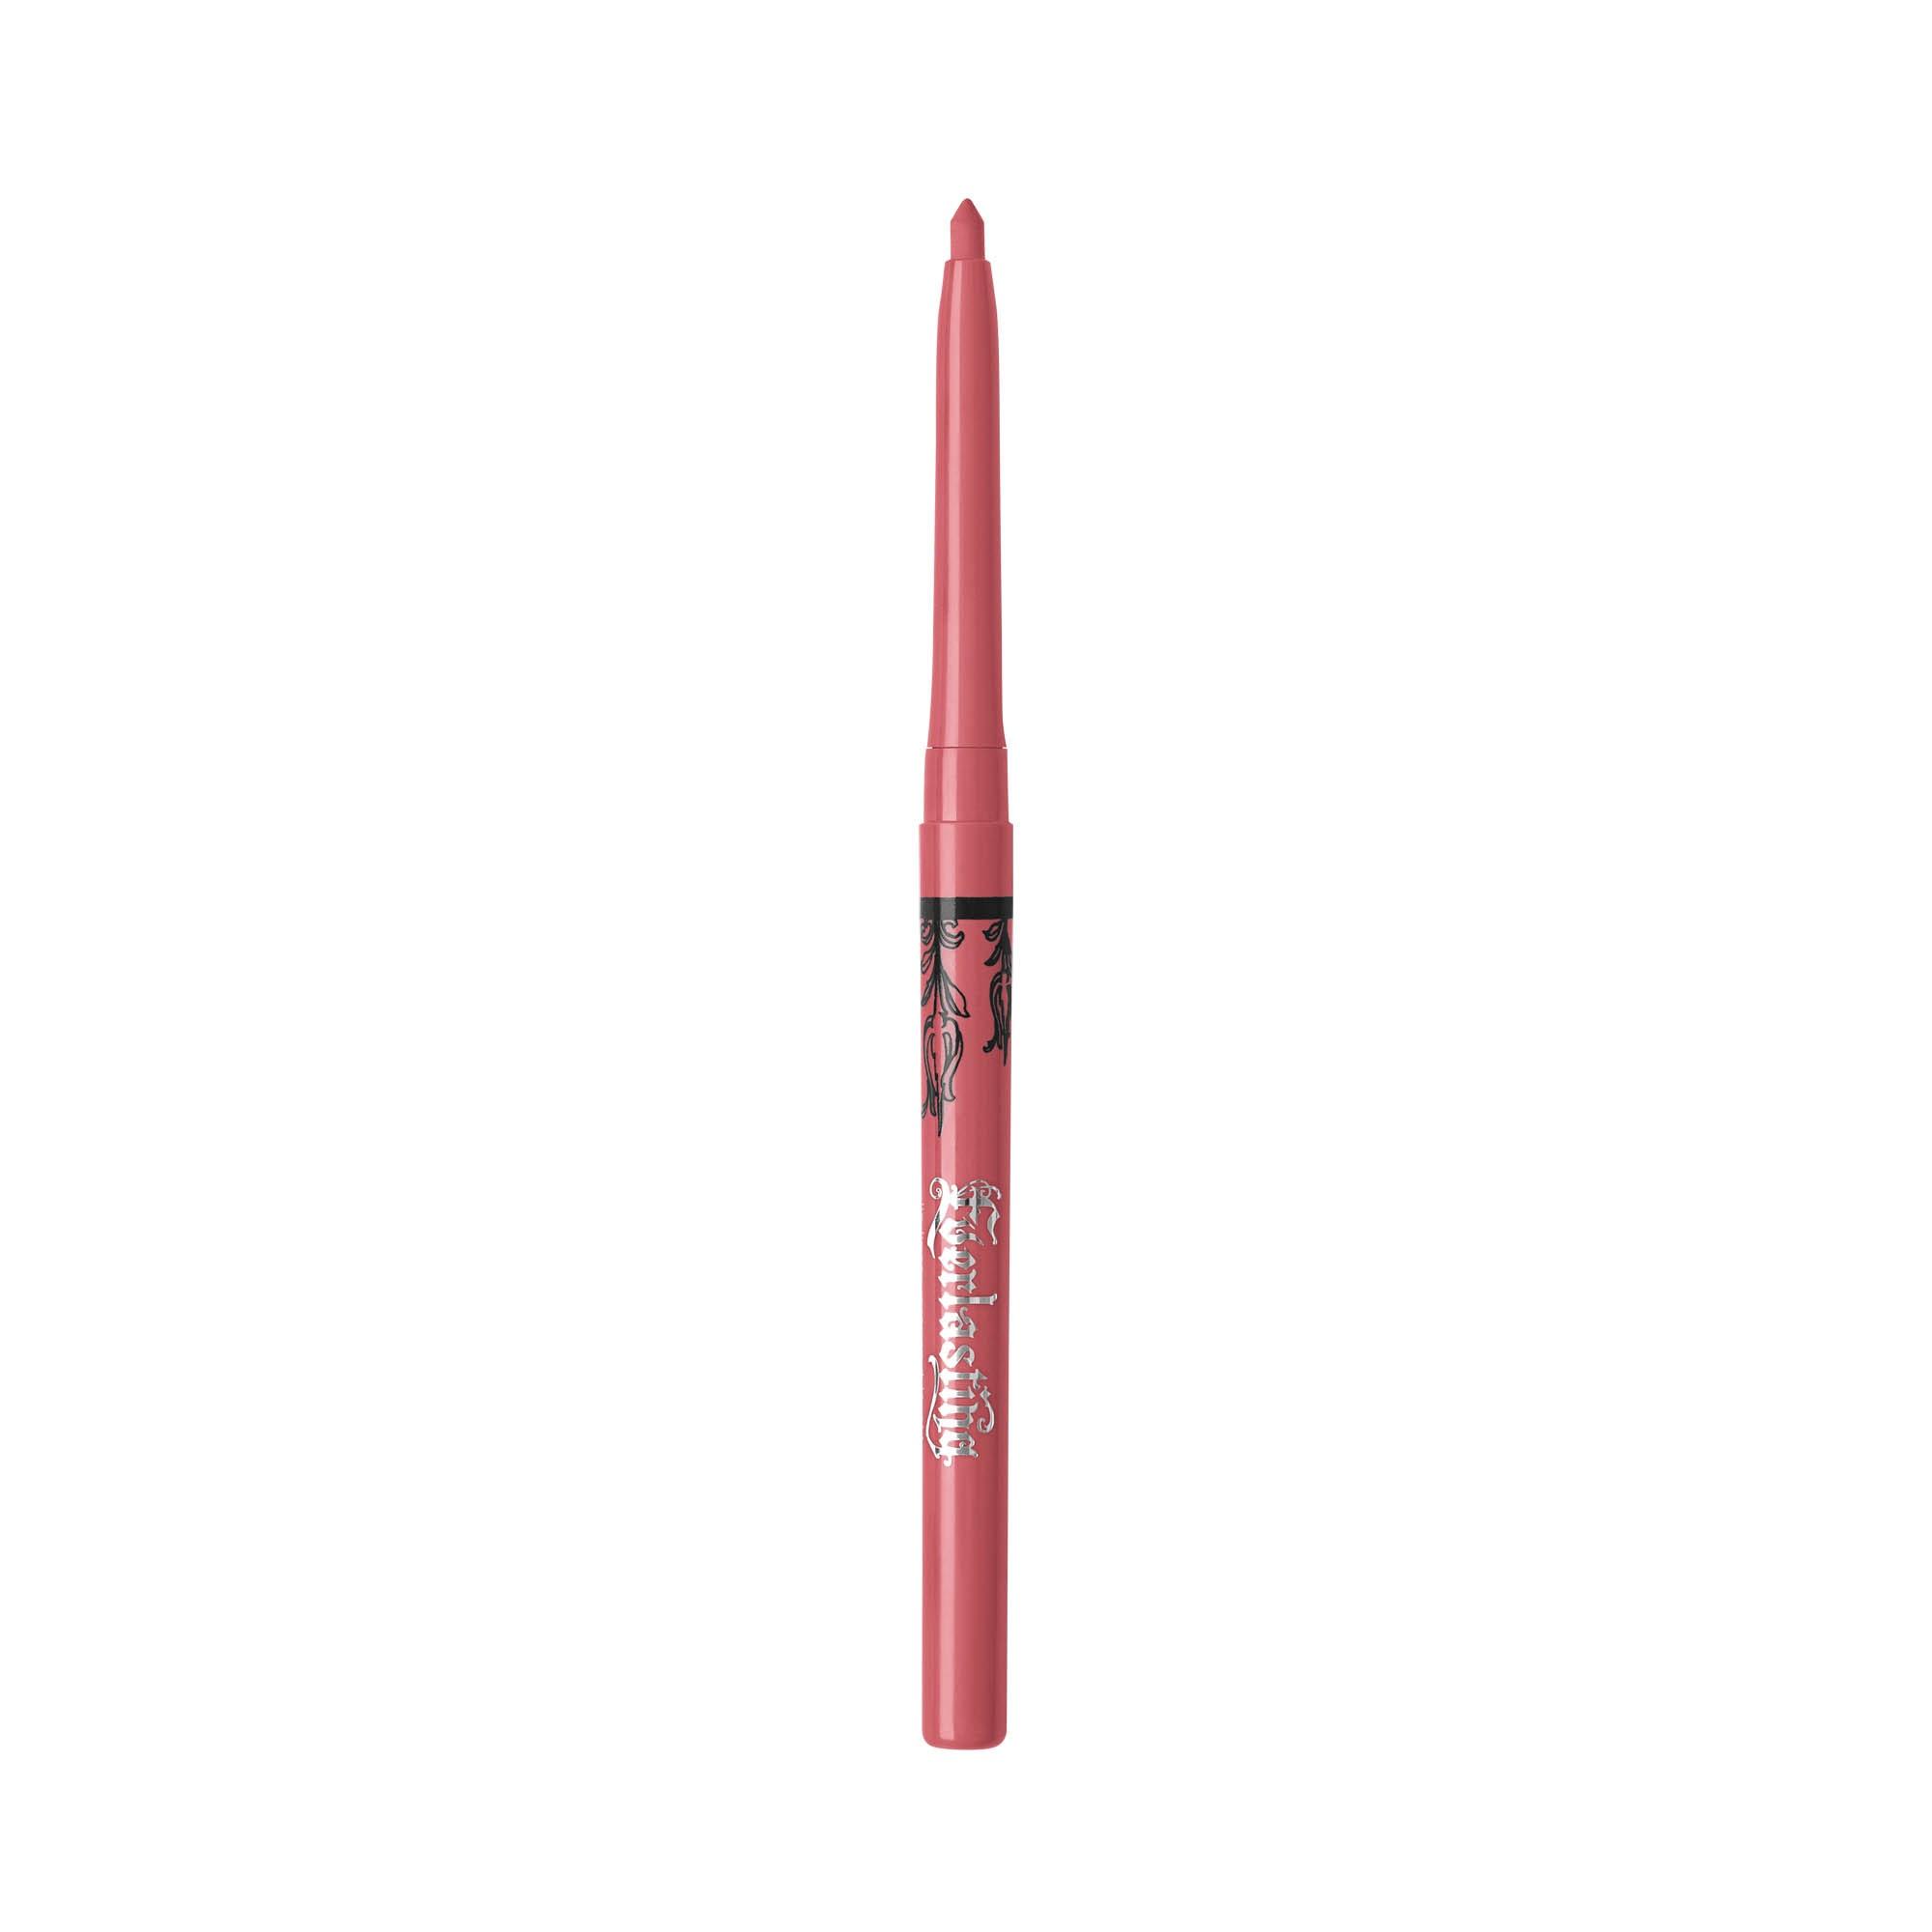 Lápis contorno de lábios Kat Von D, 17,55€